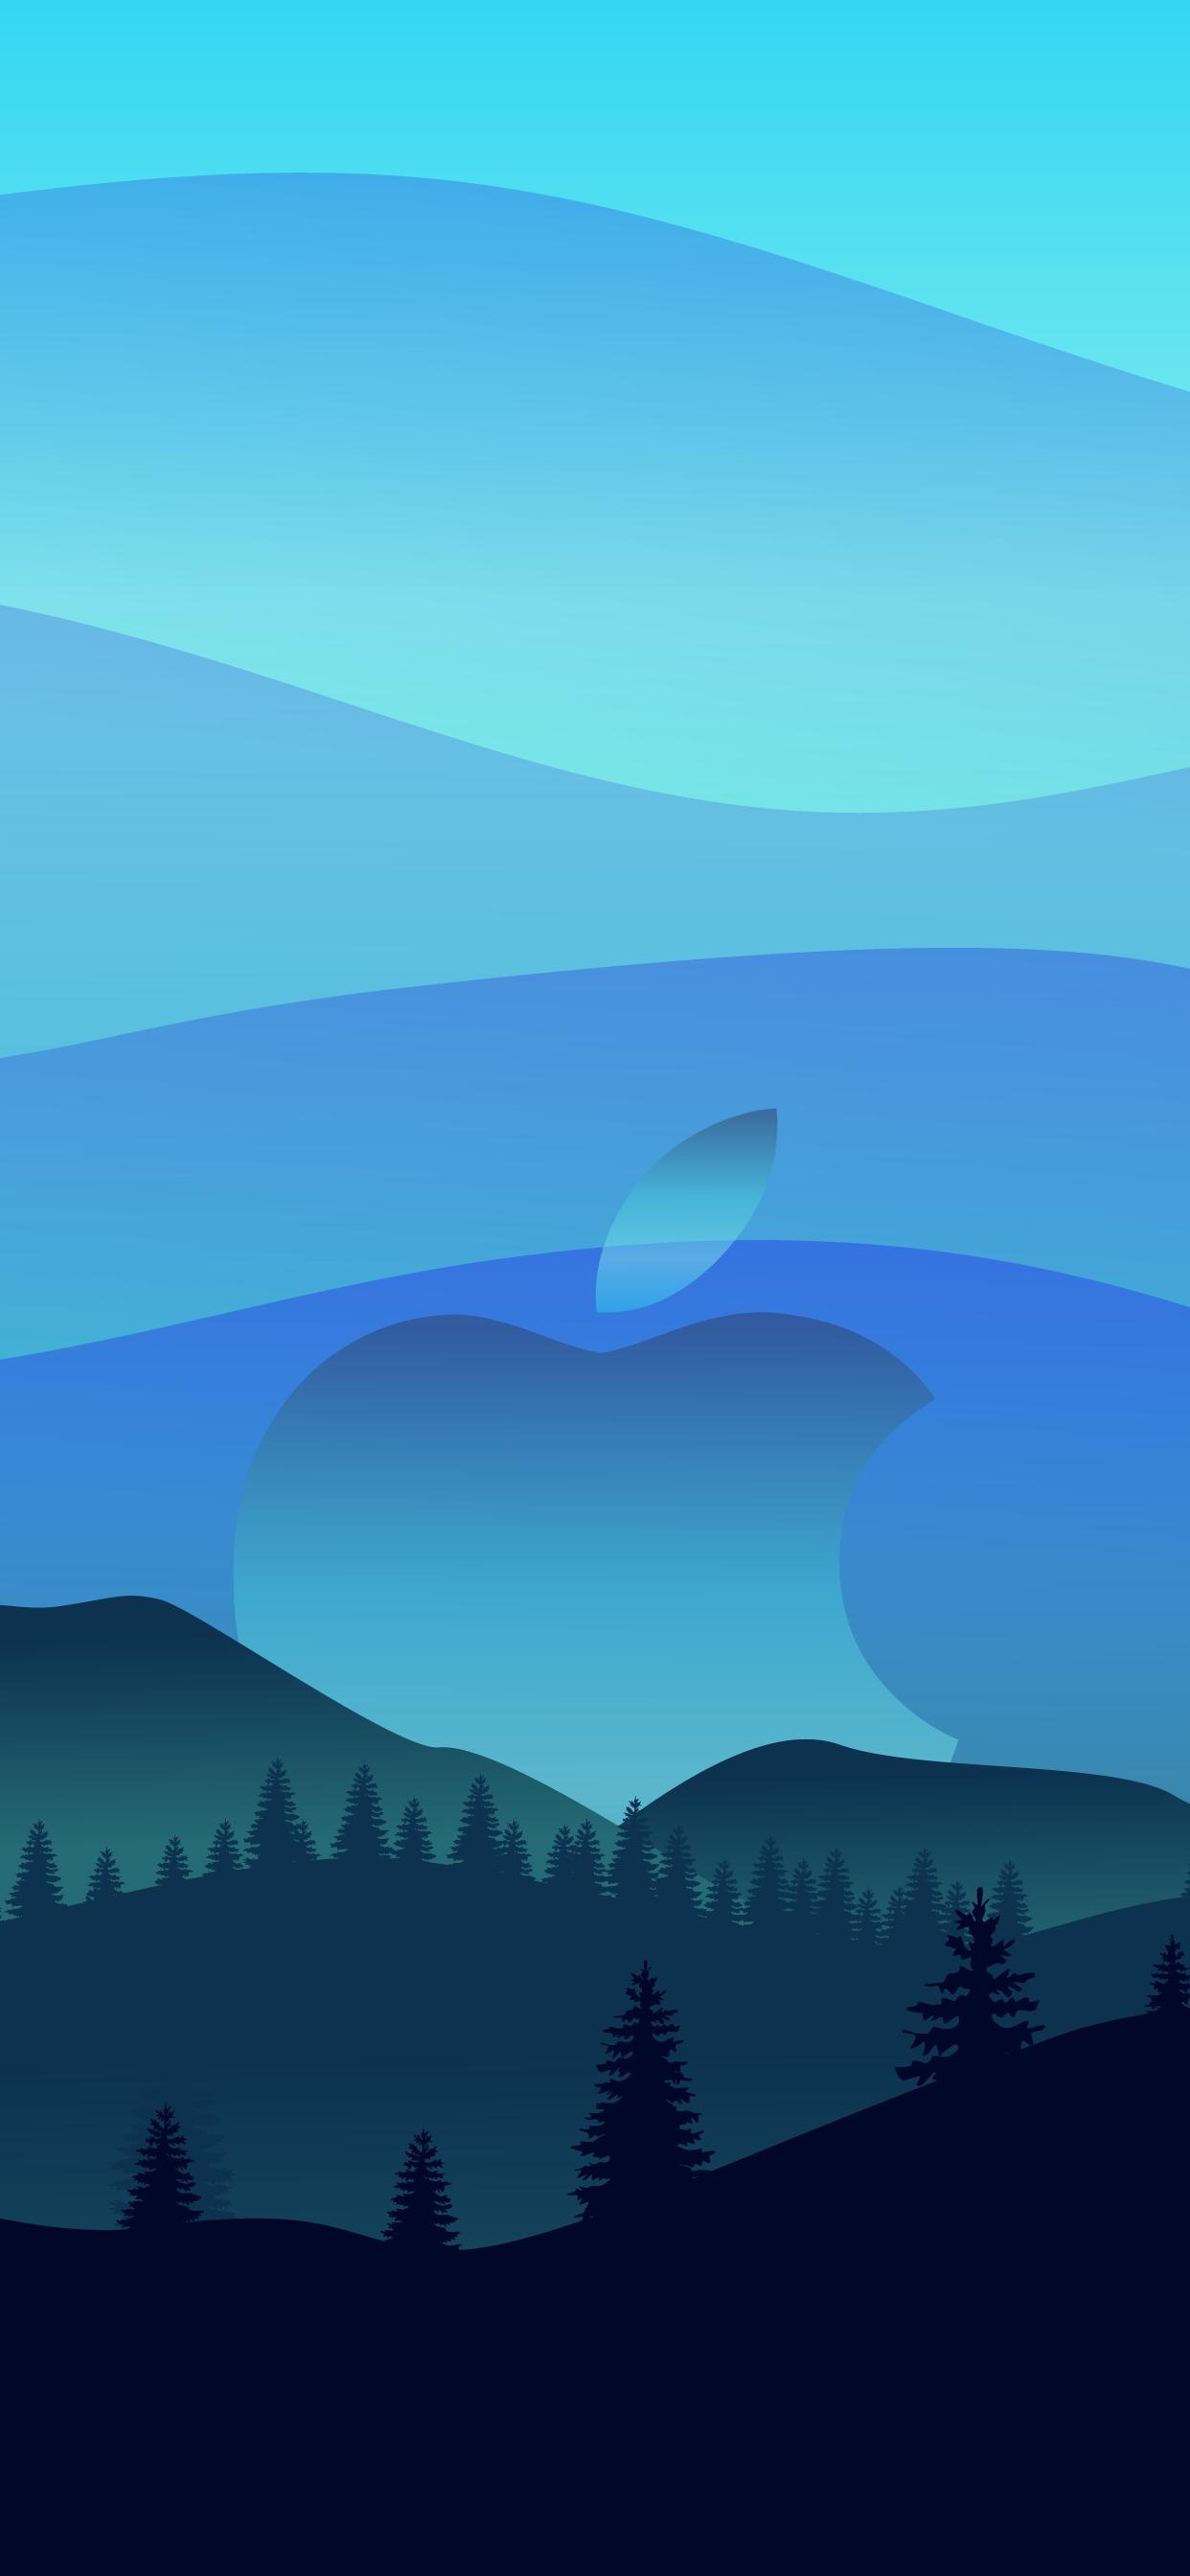 Wallpaper iphone hd blue